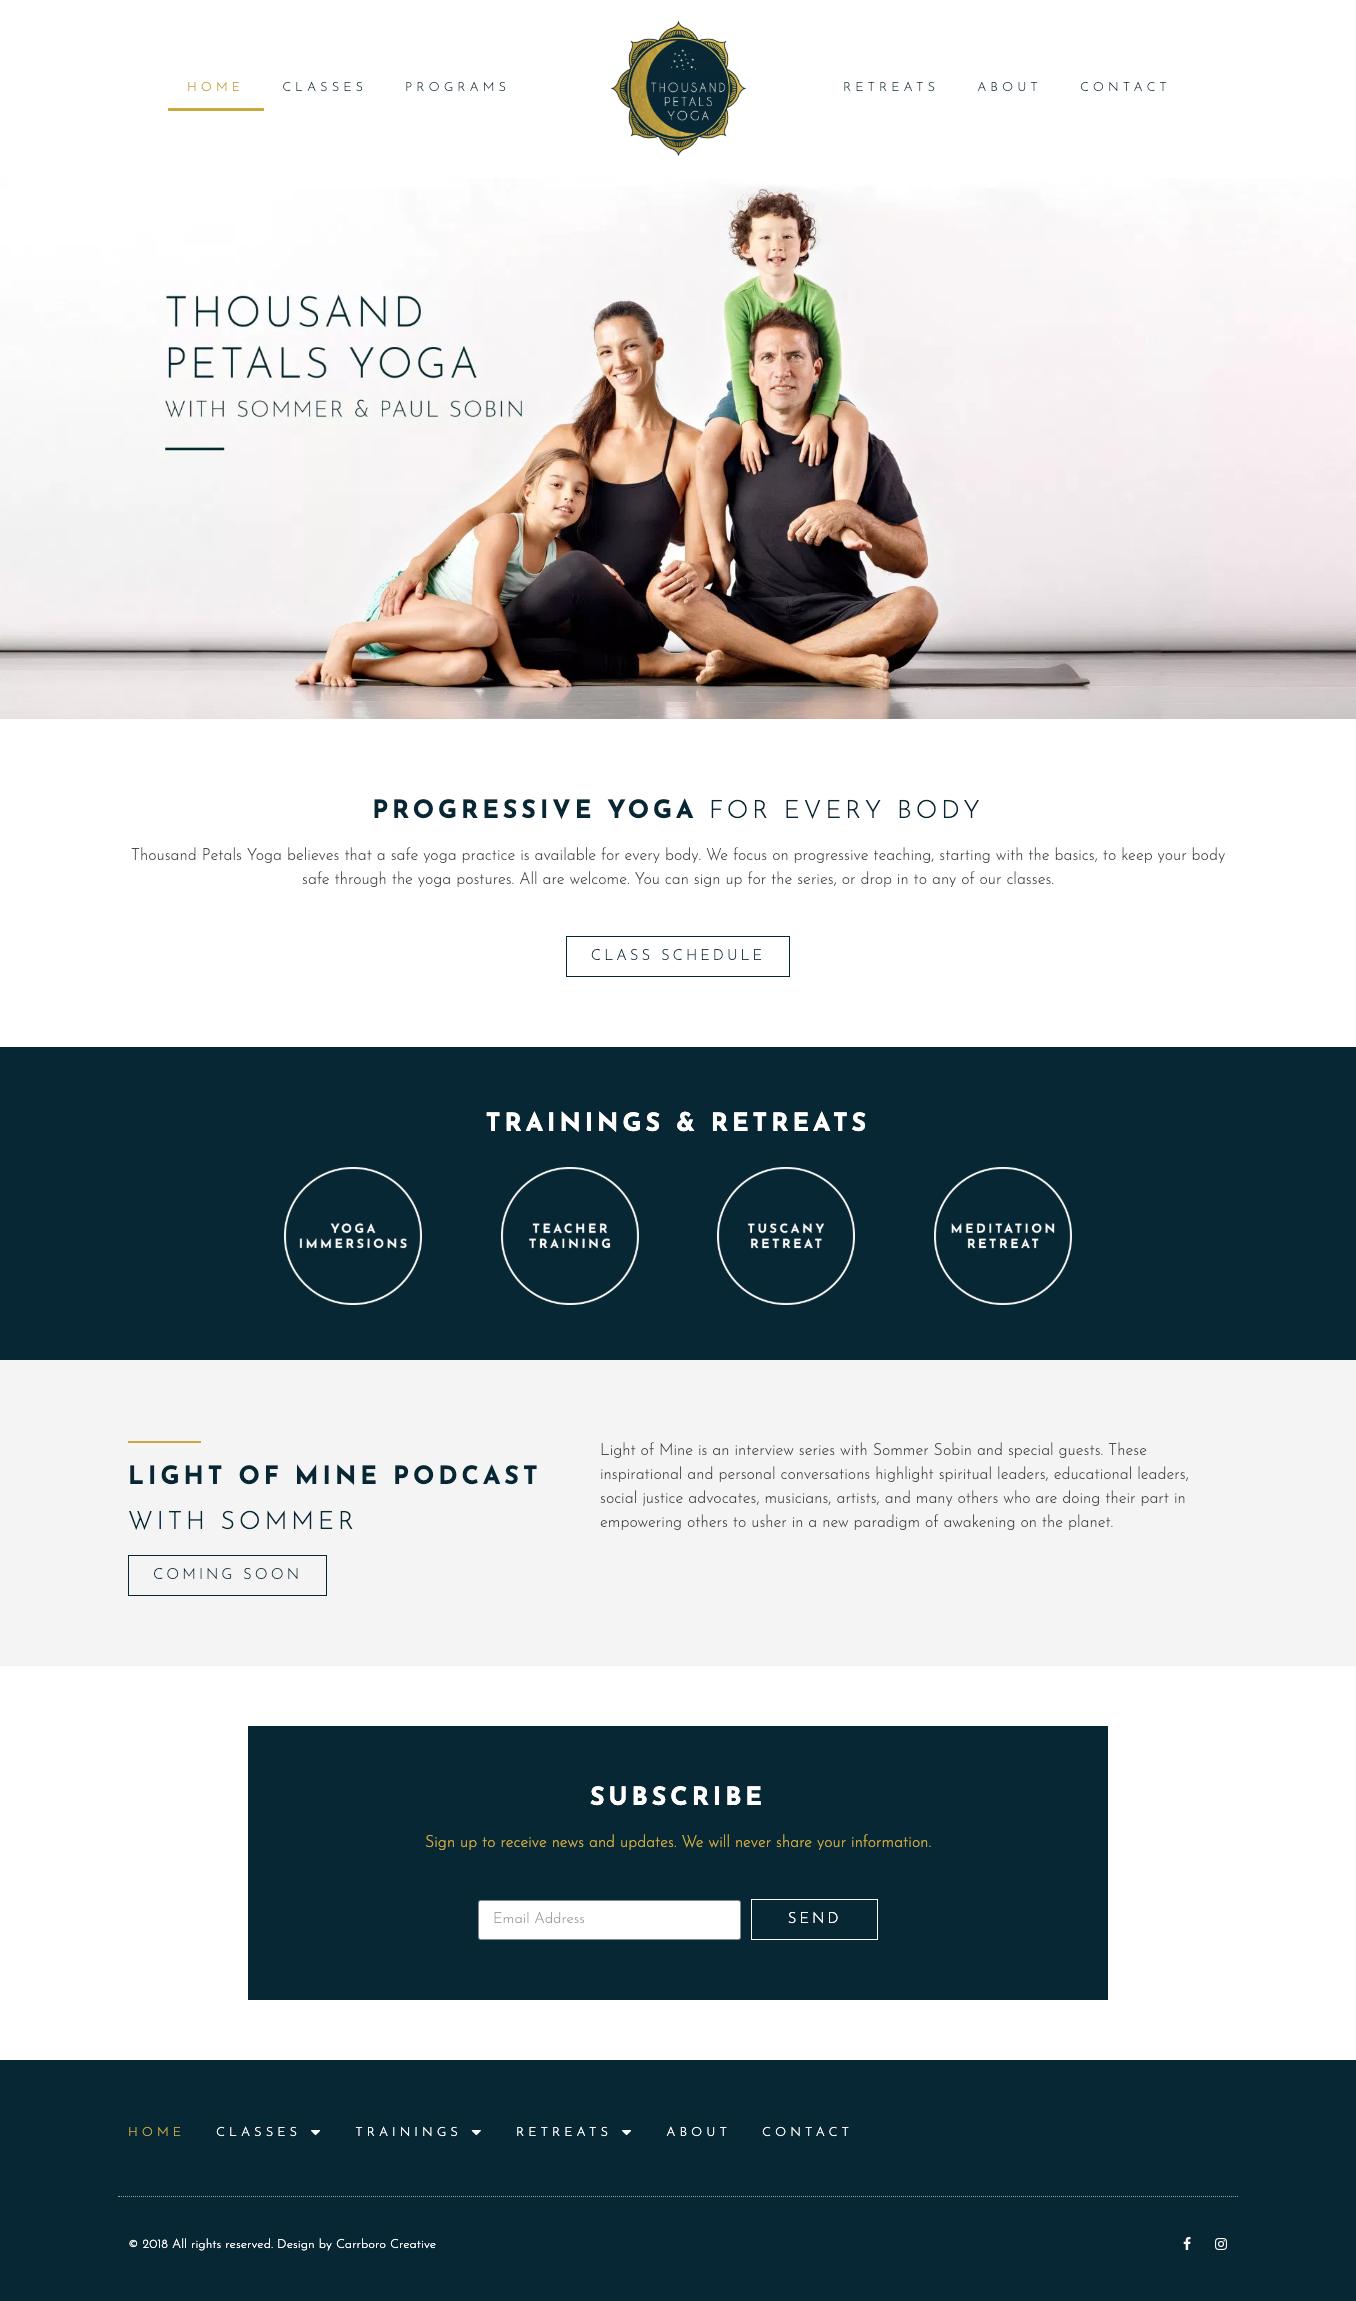 Thousand Petals Yoga Web Design Branding Project Web Design Yoga Web Branding